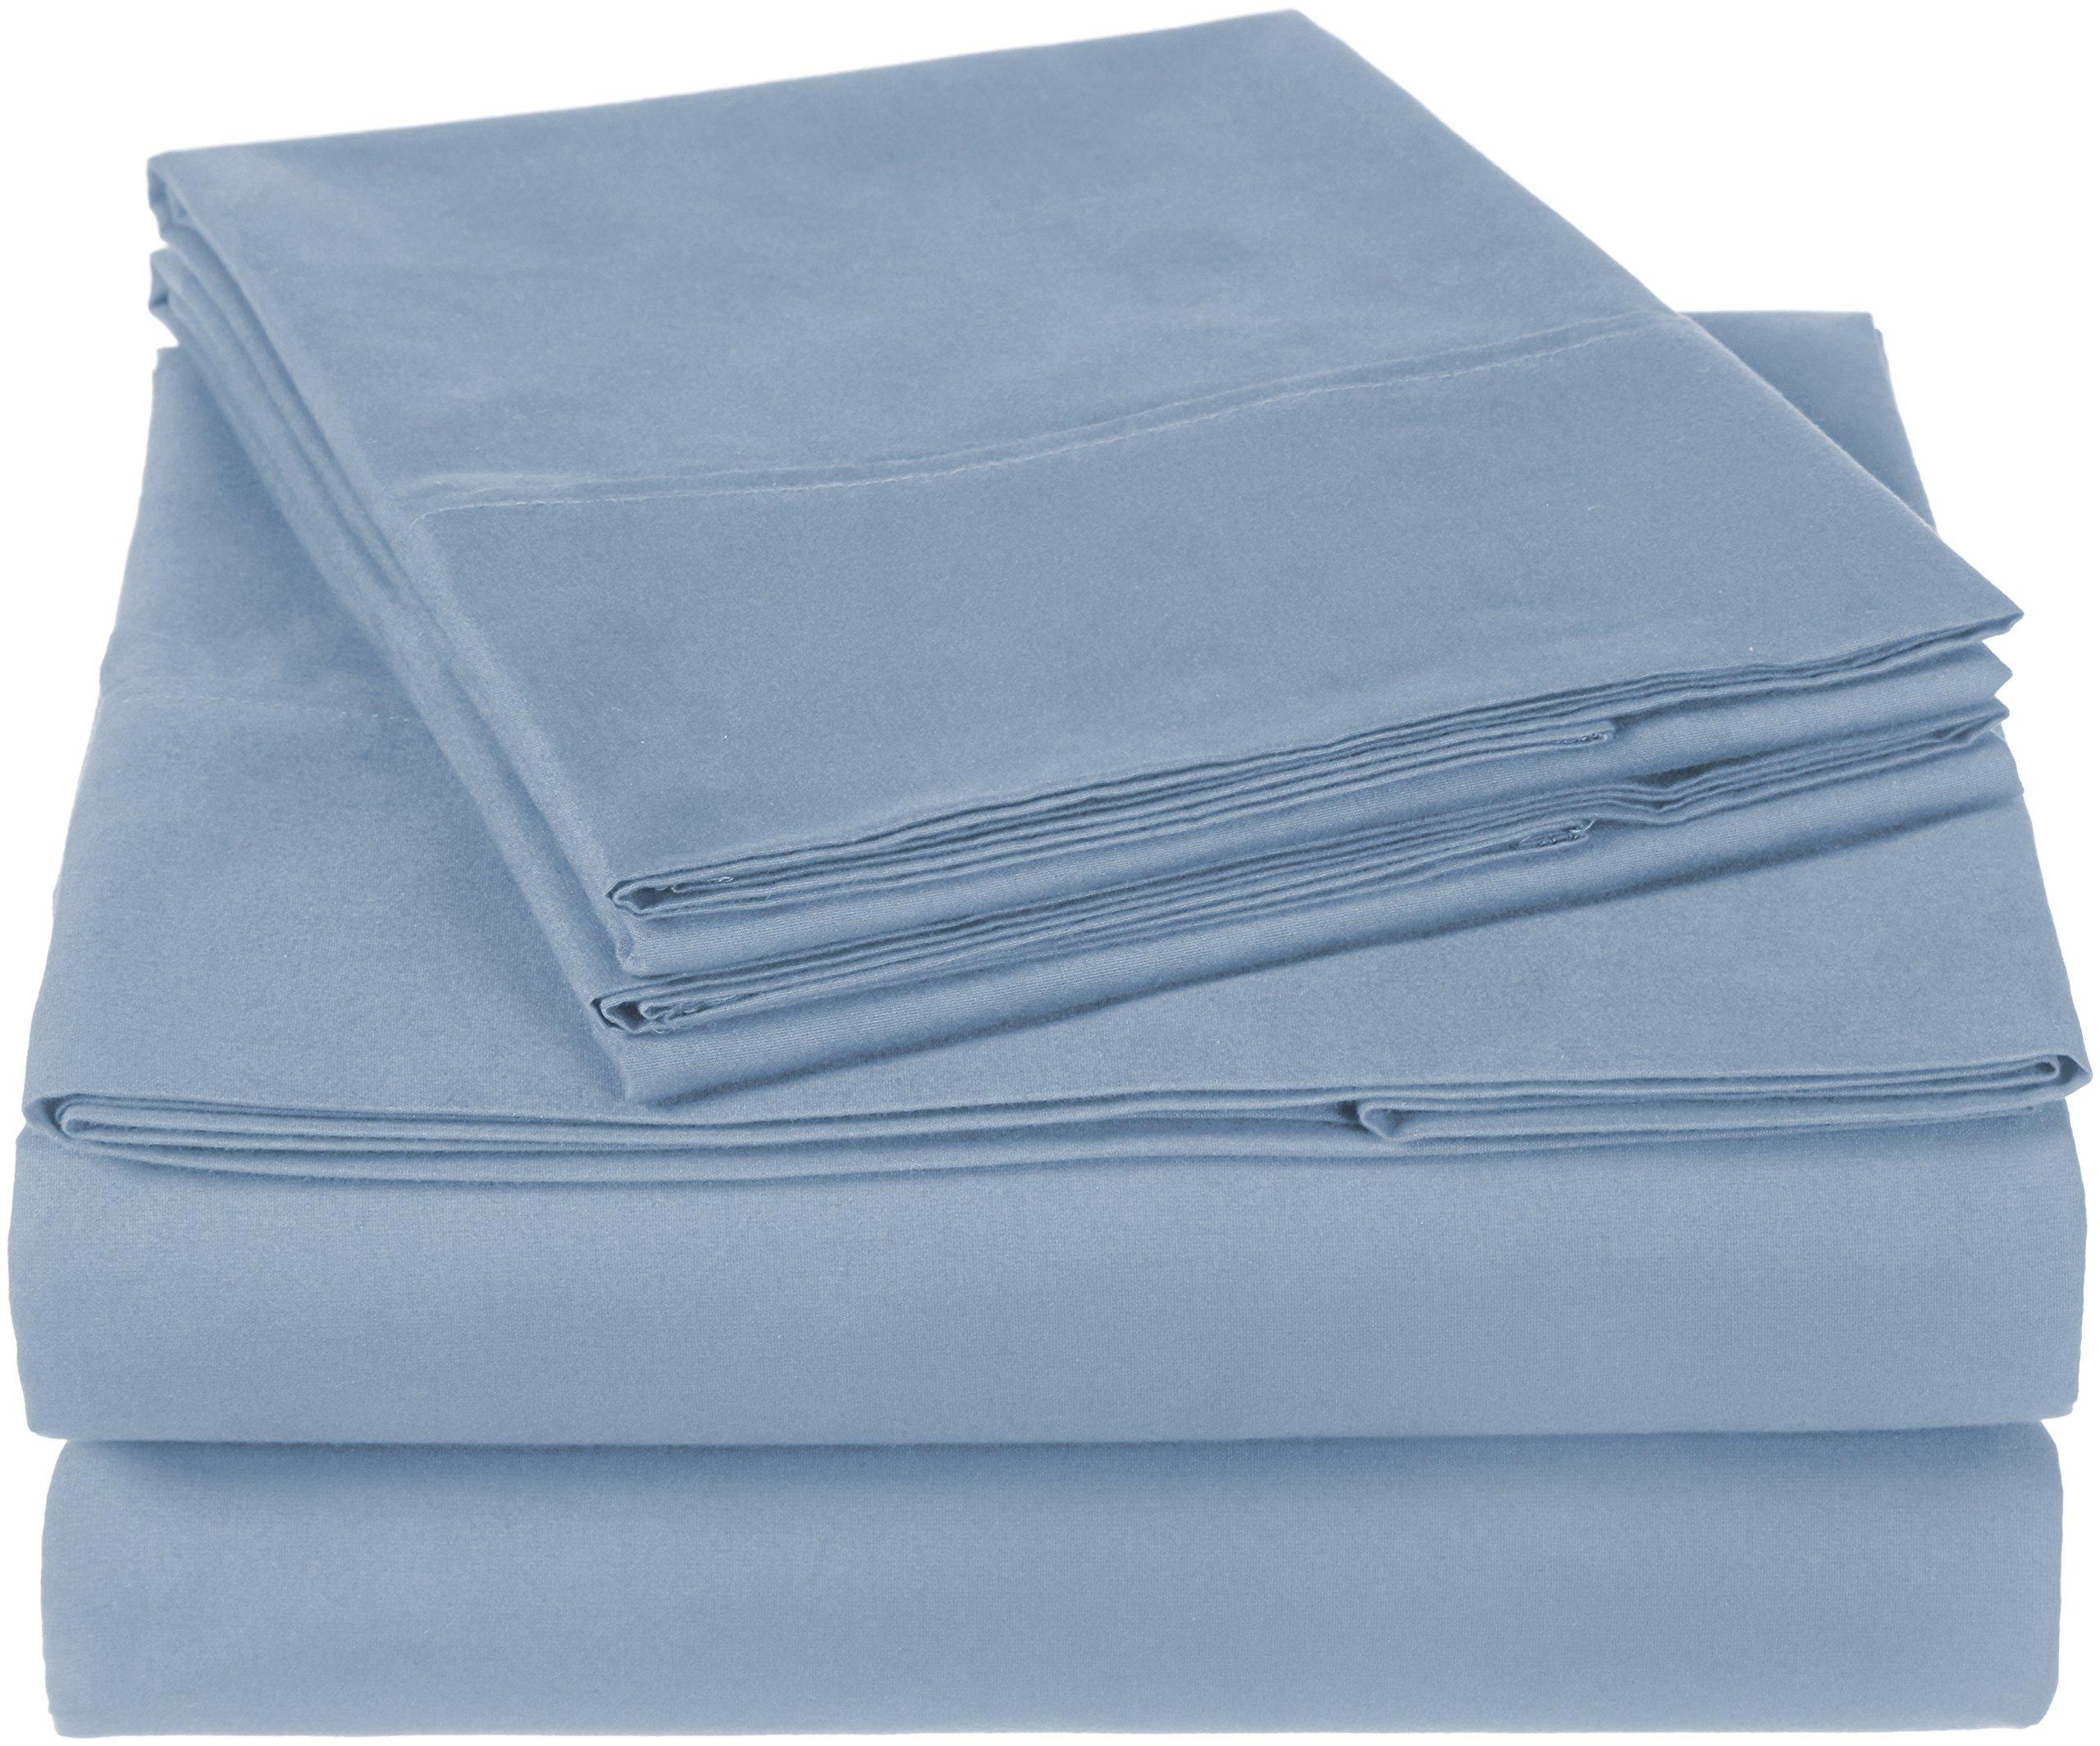 Pinzon 300 Thread Count Organic Cotton Bed Sheet Set - California King, Flint Blue